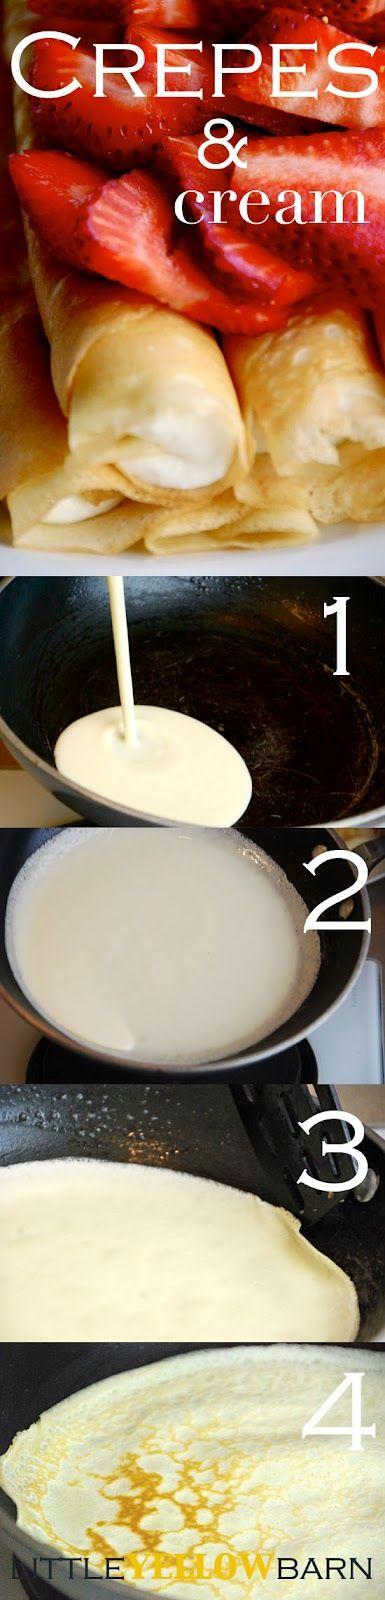 Crepes – 4 eggs, 1/2 c butter, melted, 1/3 c sugar, 1 c flour, 1 c milk, 1/4 c water, 1 tsp. vanilla, dash